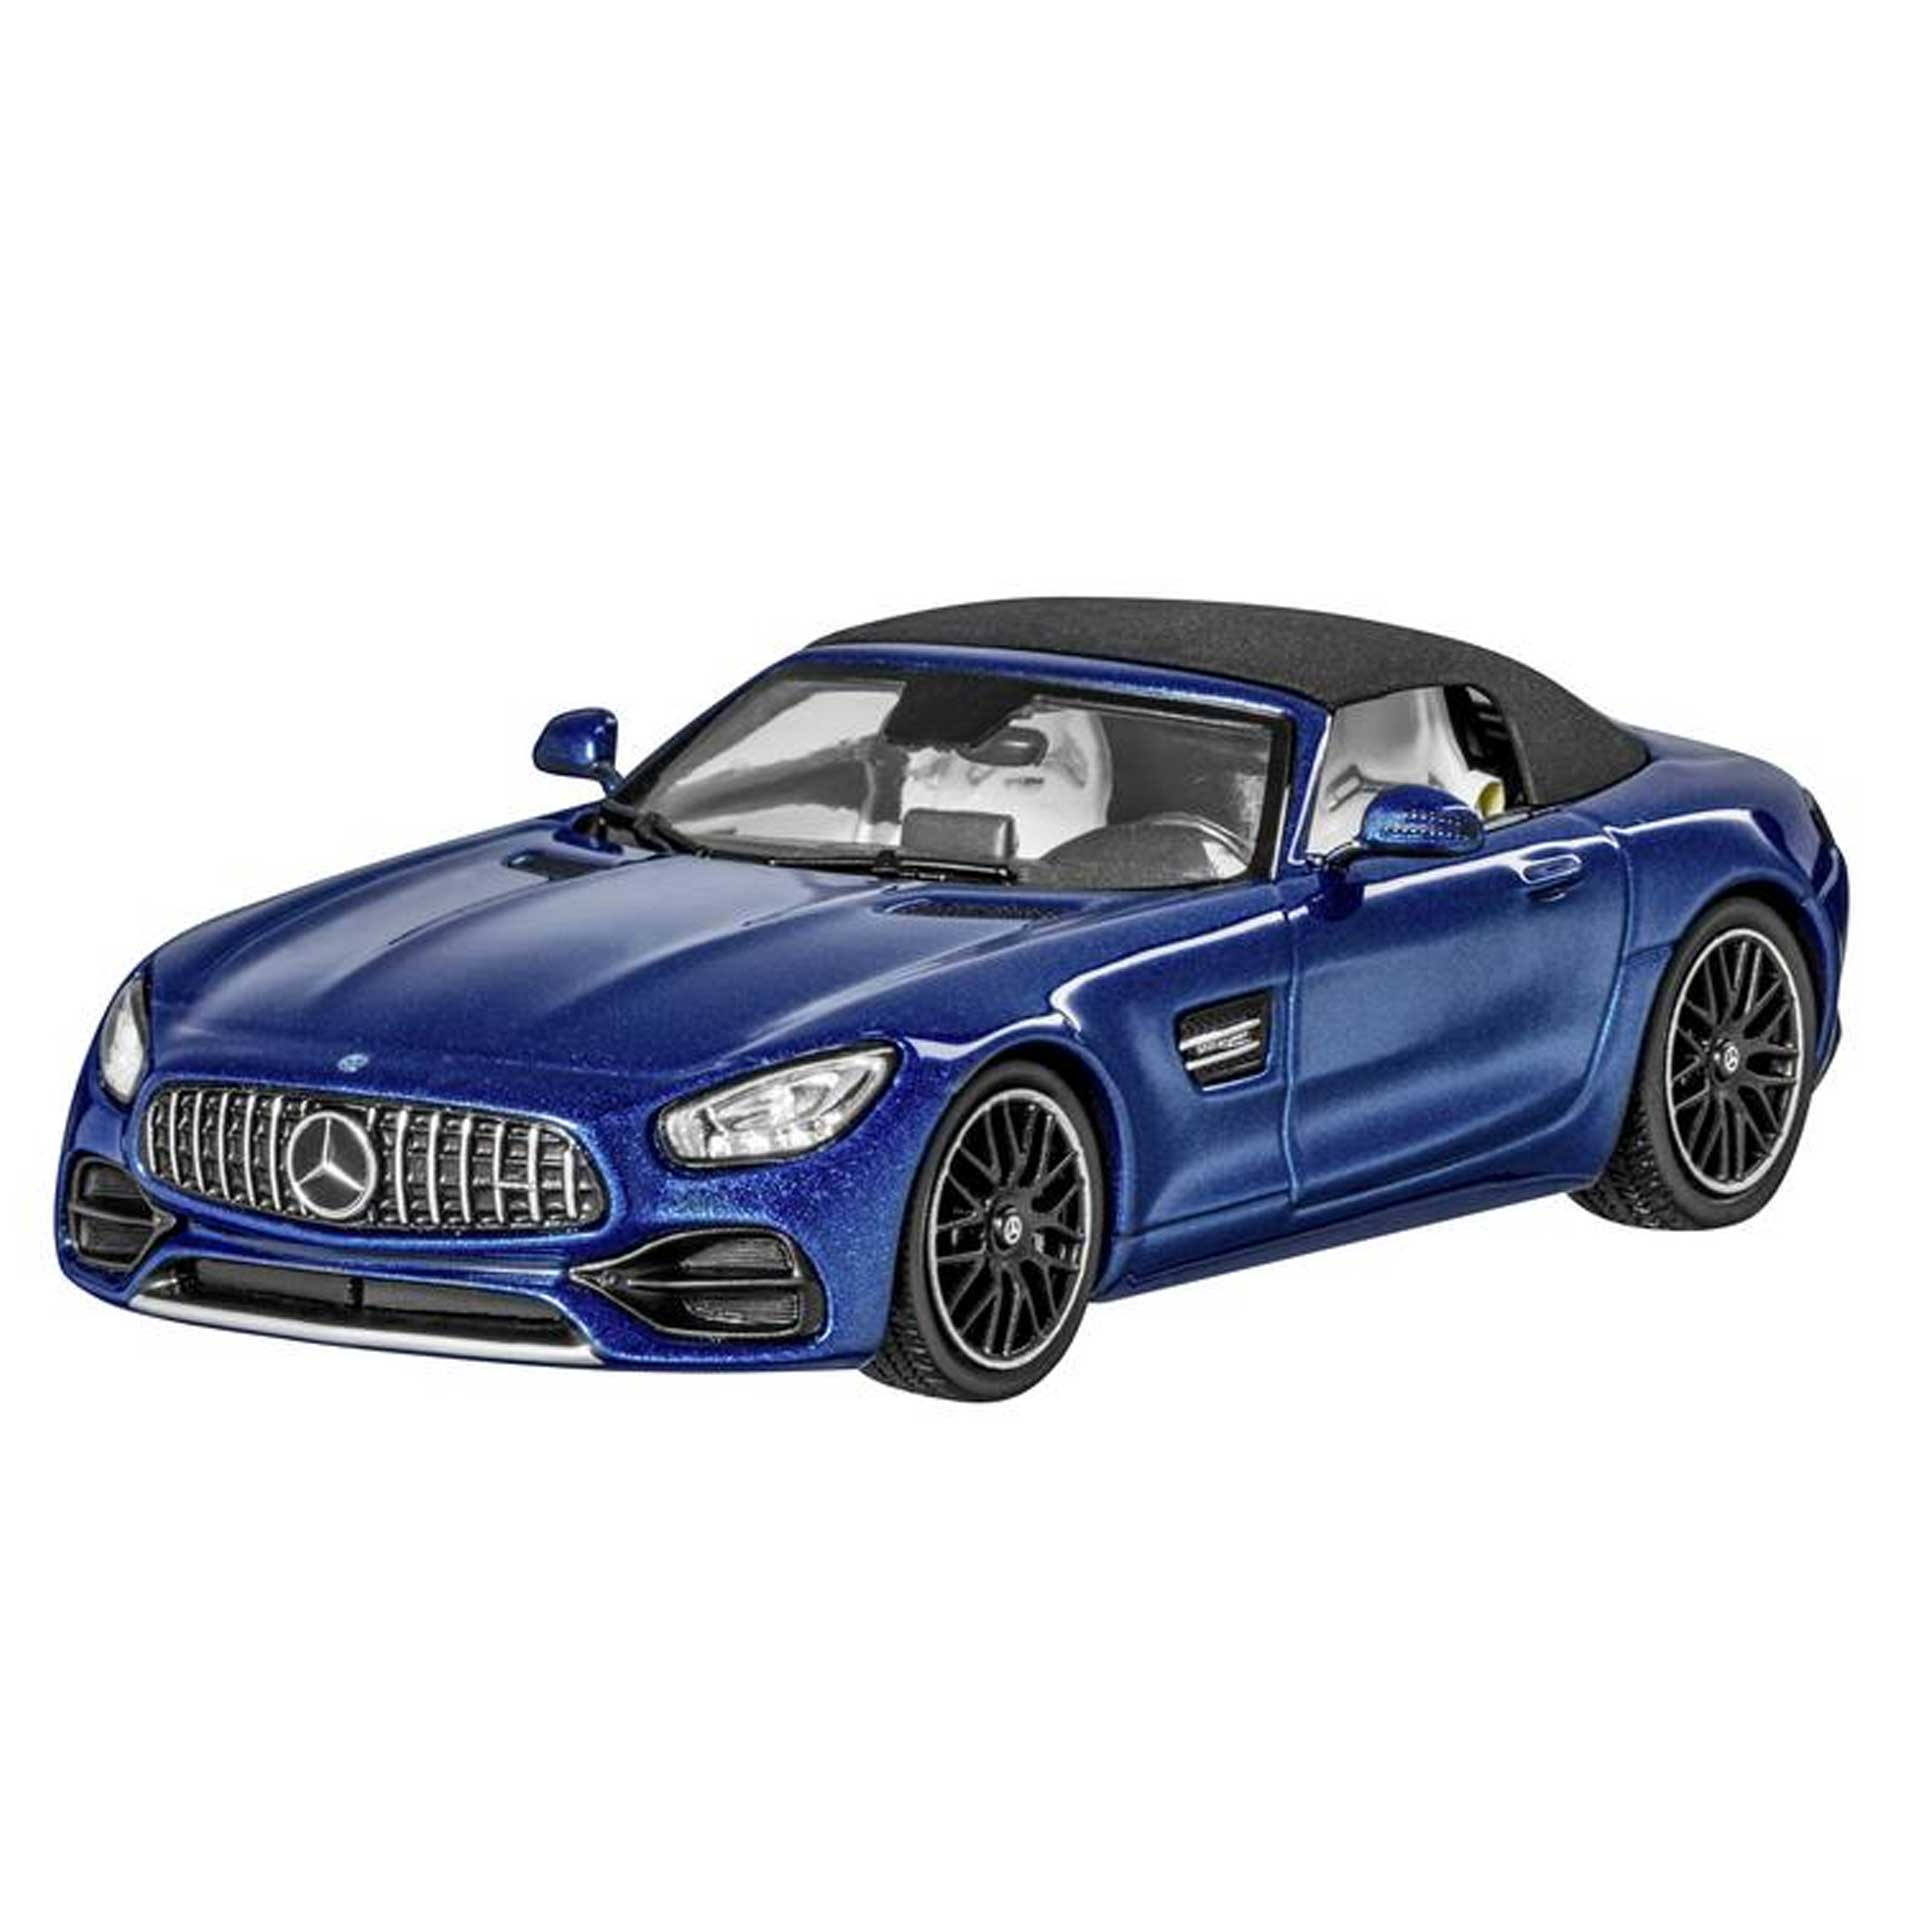 Mercedes-Benz AMG GT Roadster R190 Modellauto 1:43 brillantblau